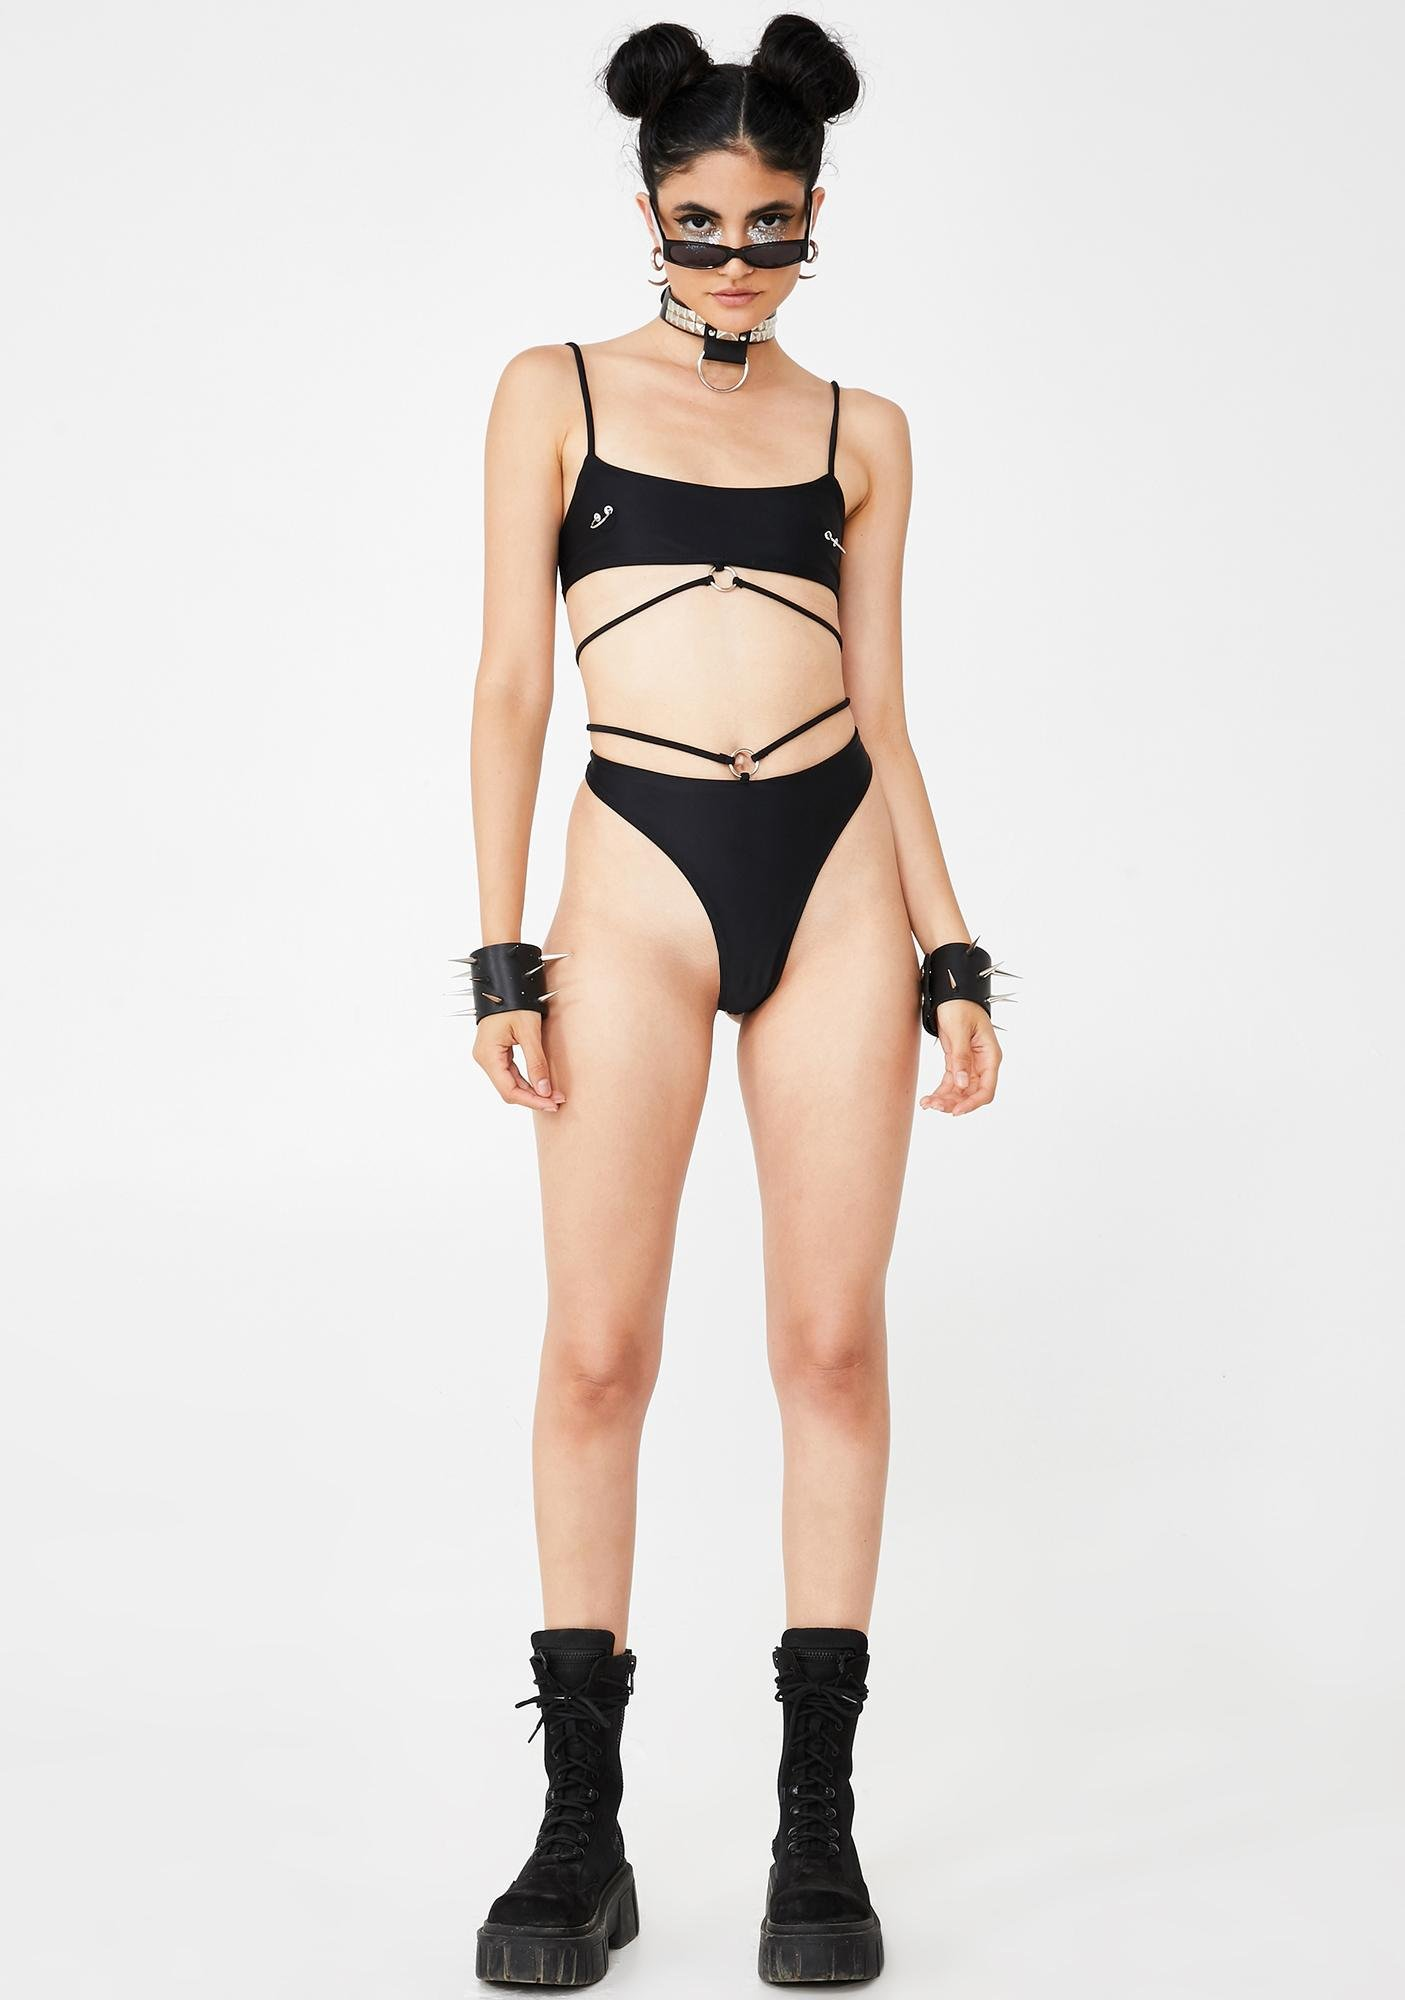 Riccetti Clothing Nip Slip Tank Top